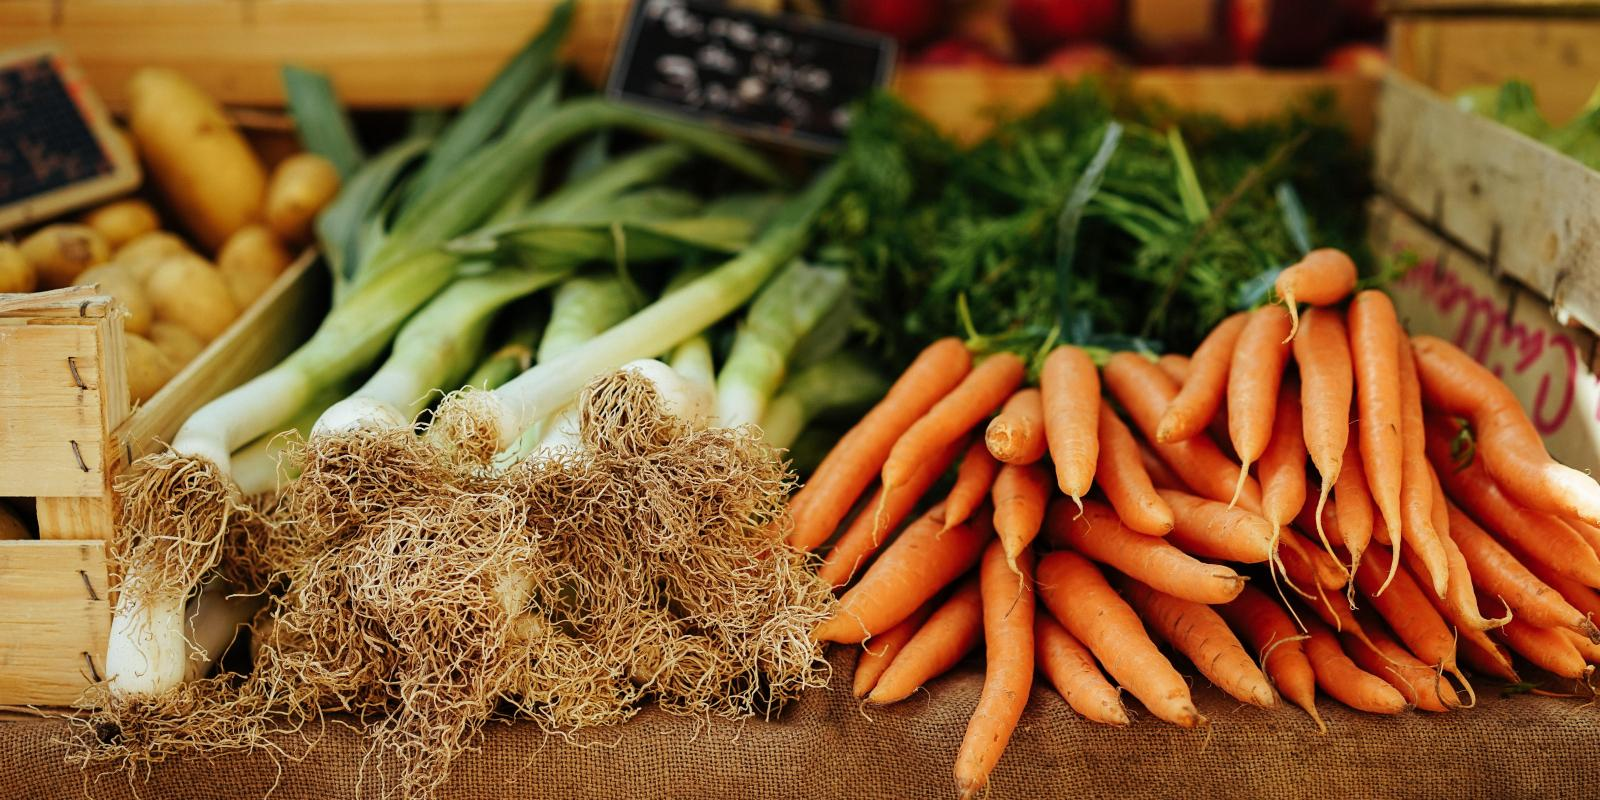 Porros i pastanagues | Pxhere